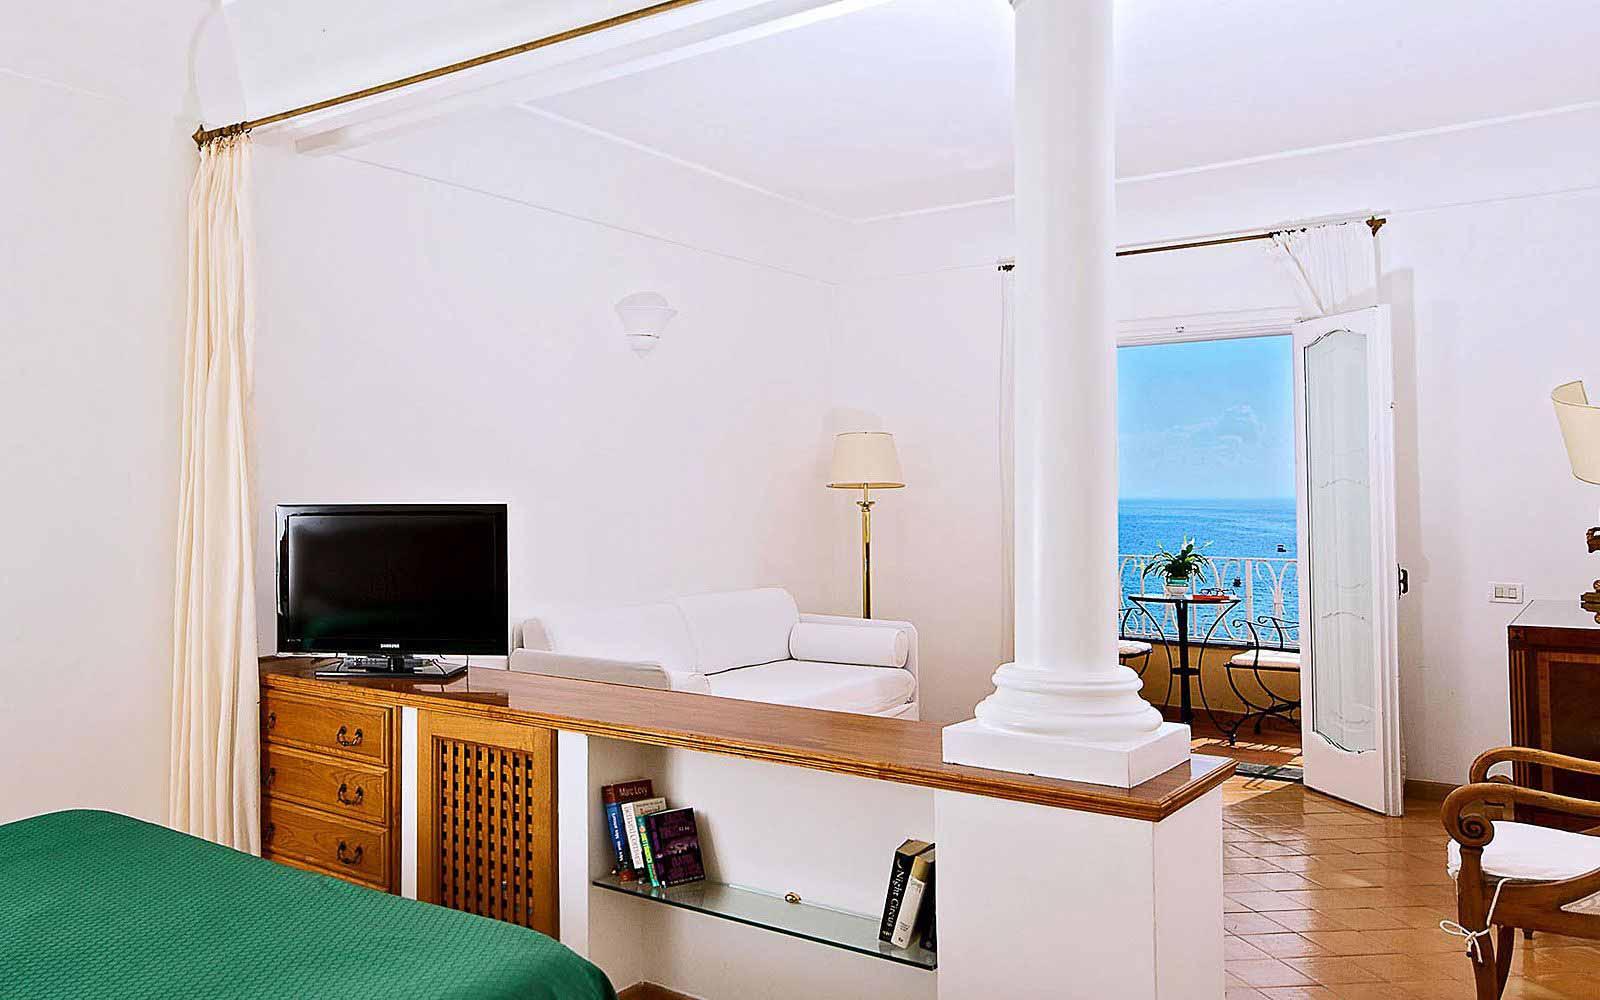 Junior Suite with balcony at Covo Dei Saraceni